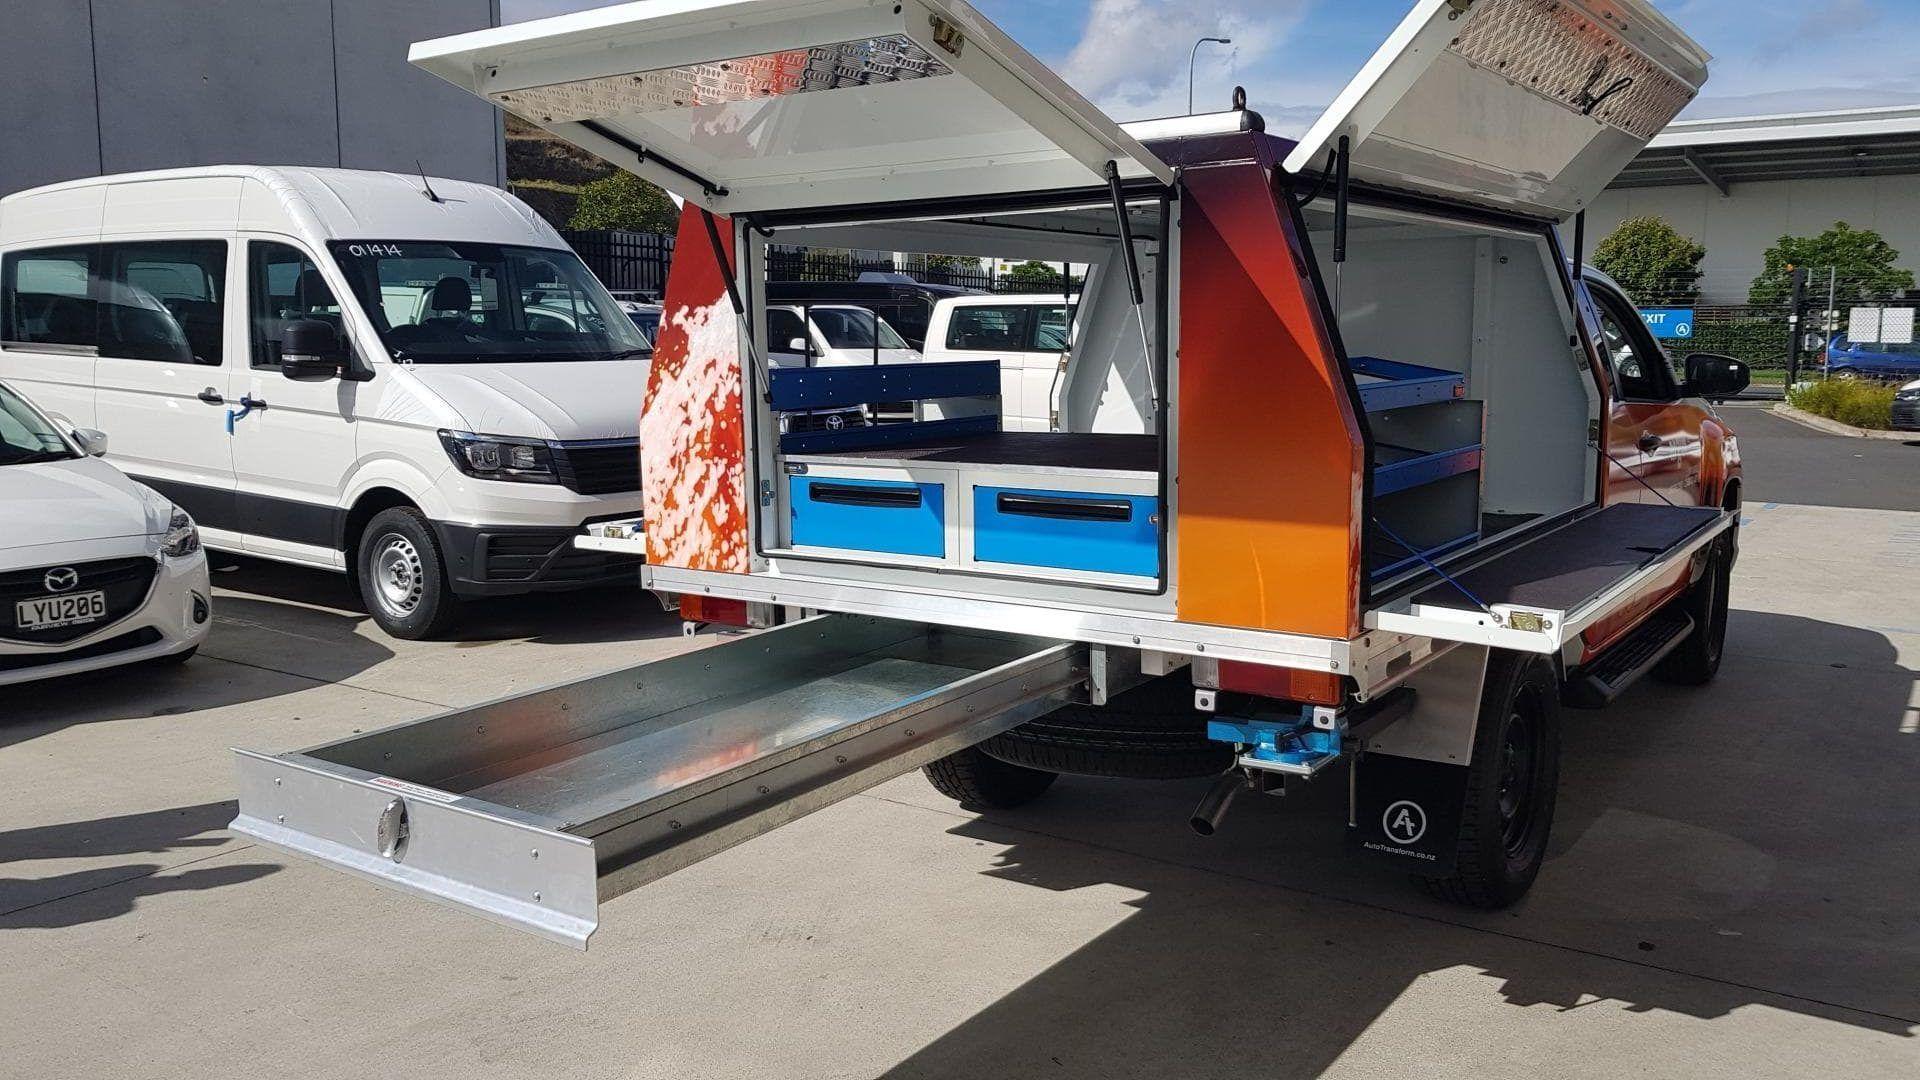 Ute service body with underfloor aluminium tray